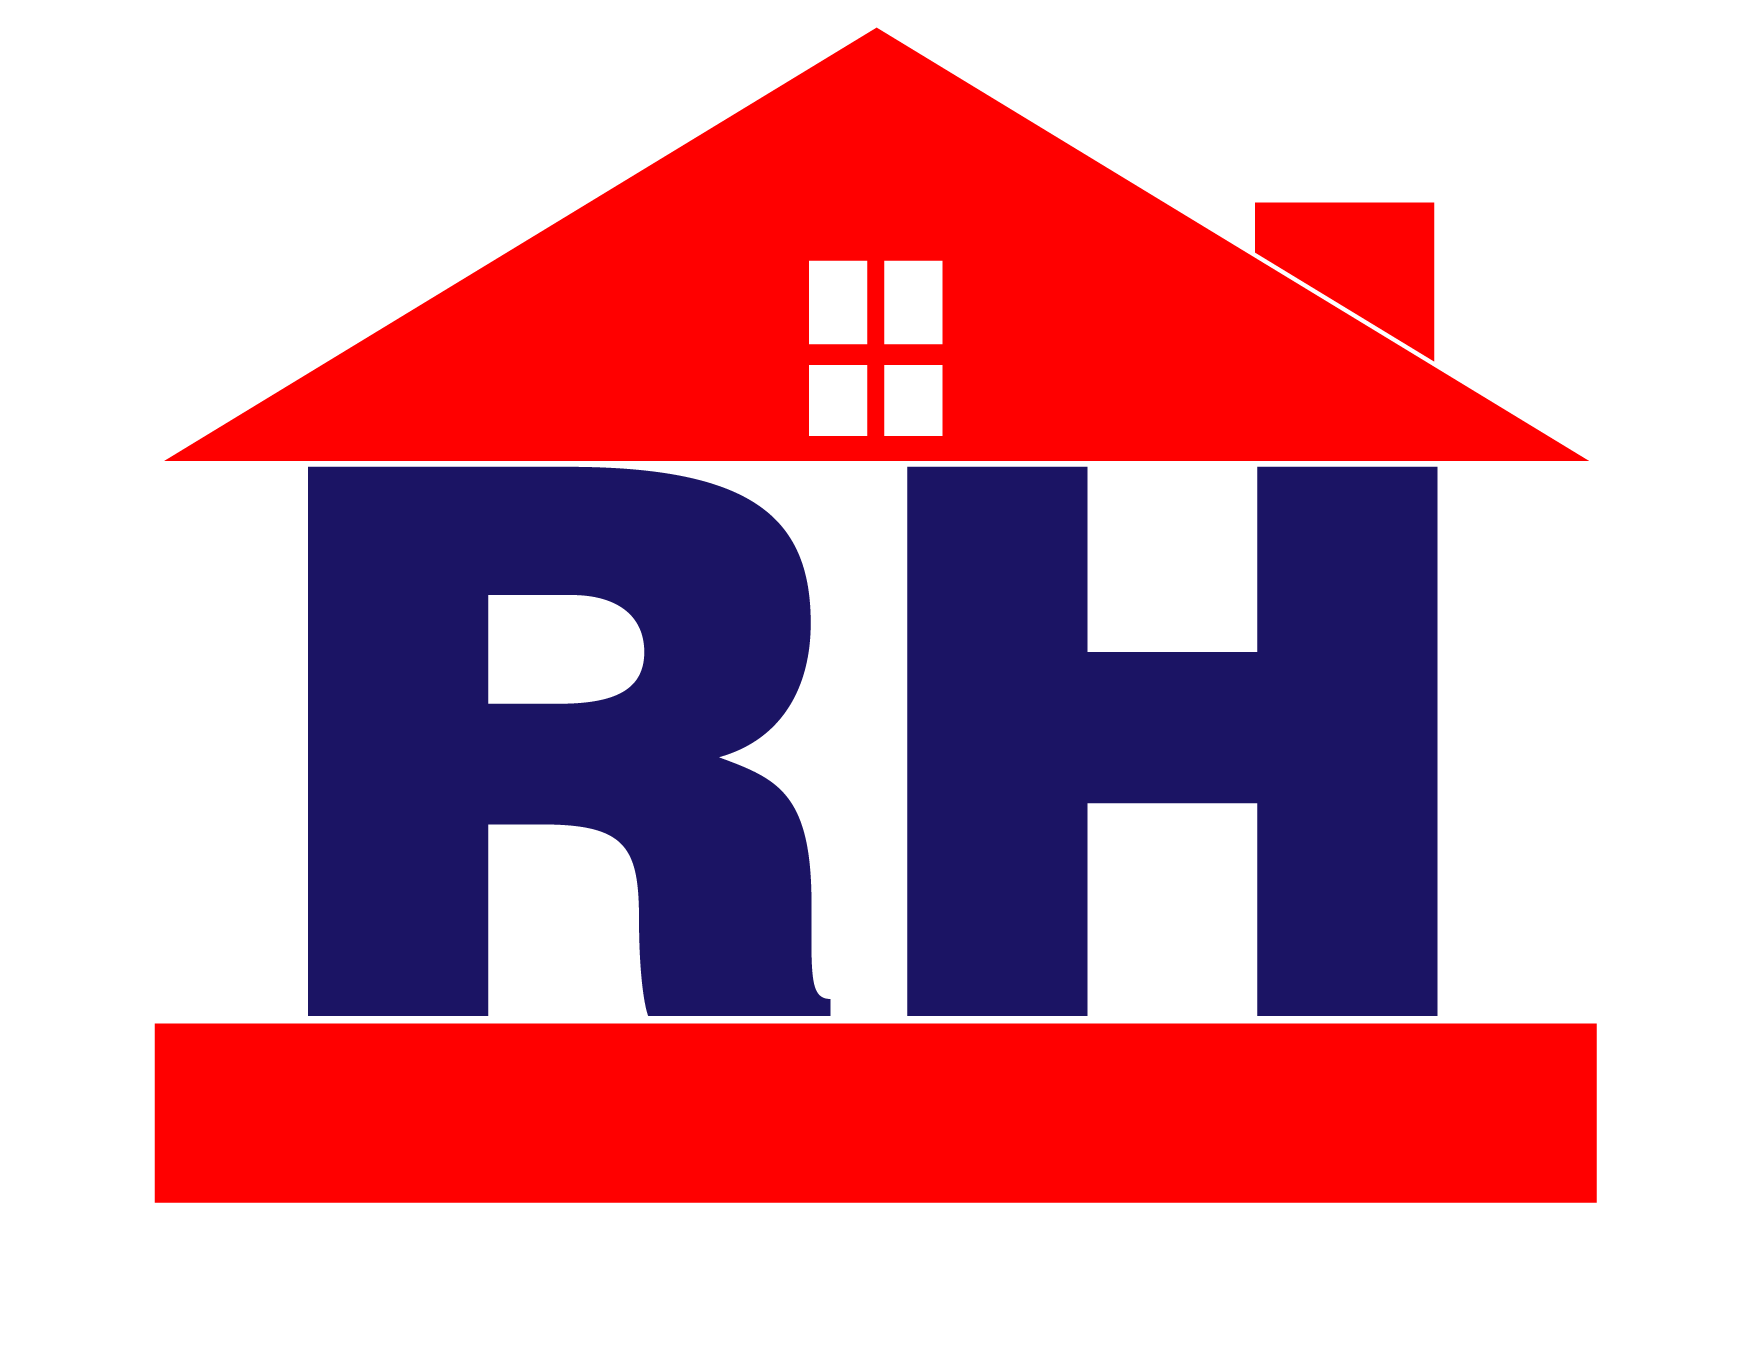 Red house logo design practice by deptirado on deviantart for House logo design free